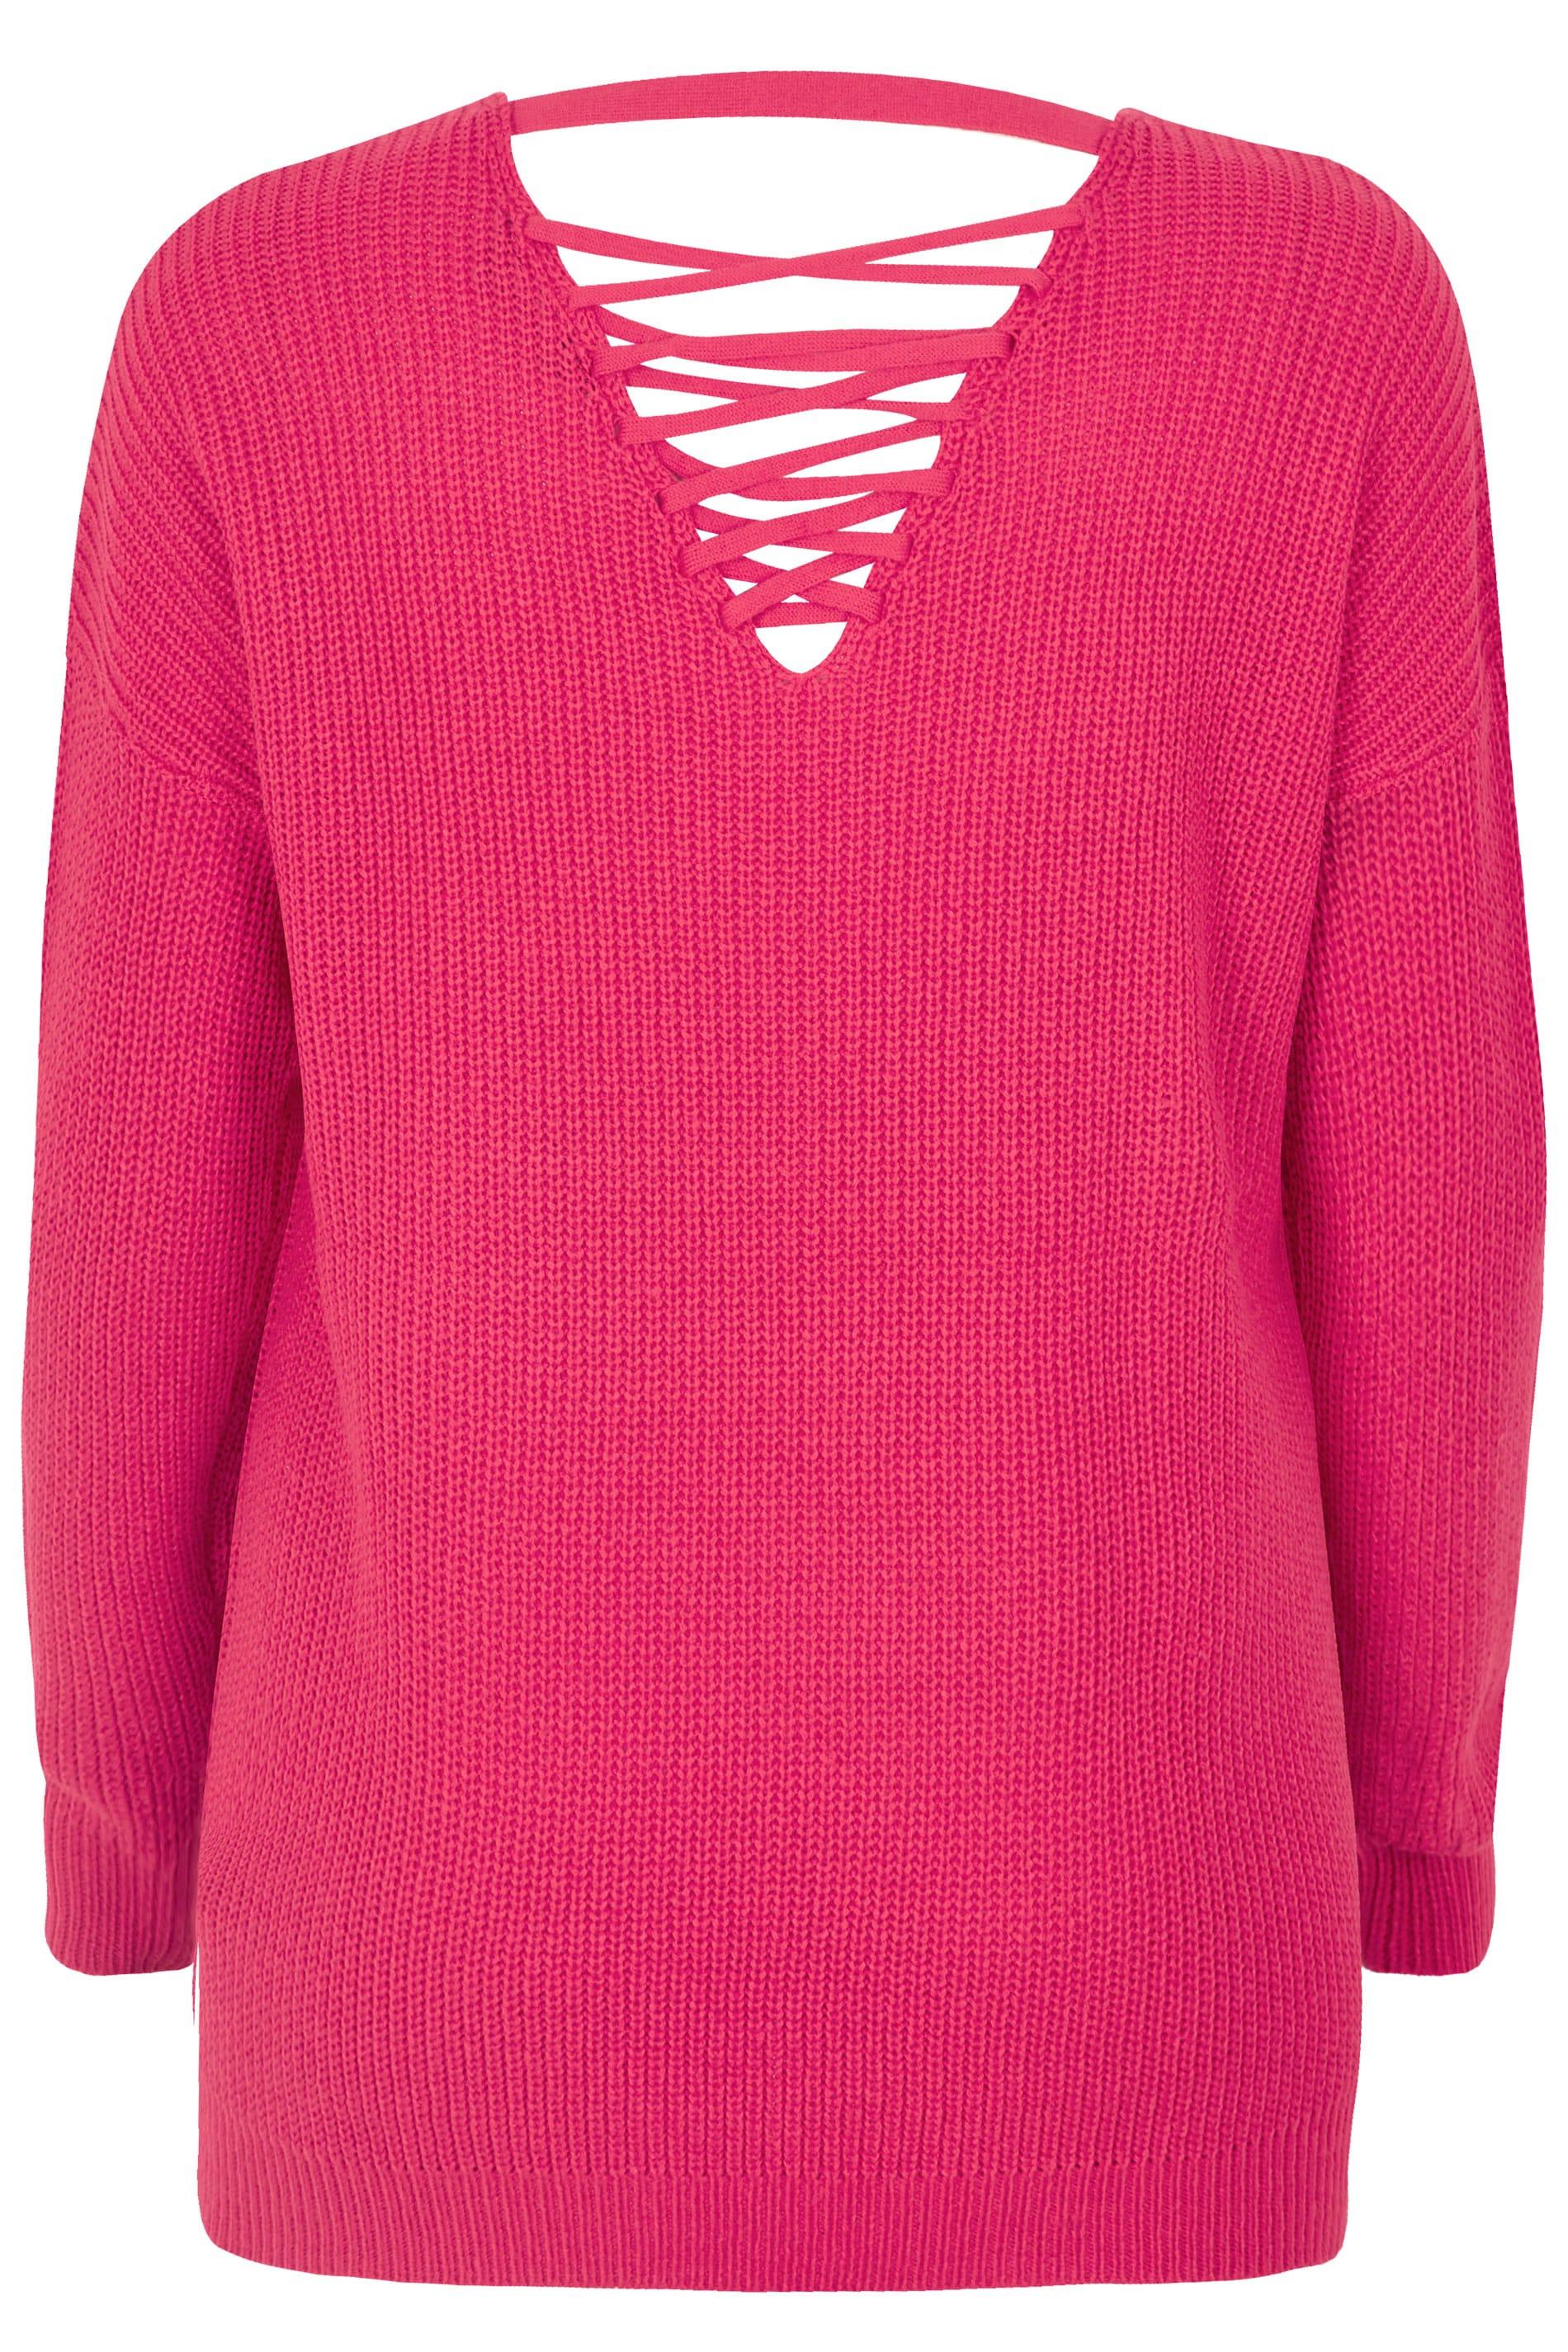 Rode cashmilon trui, grote maten 44 64 | Yours Clothing